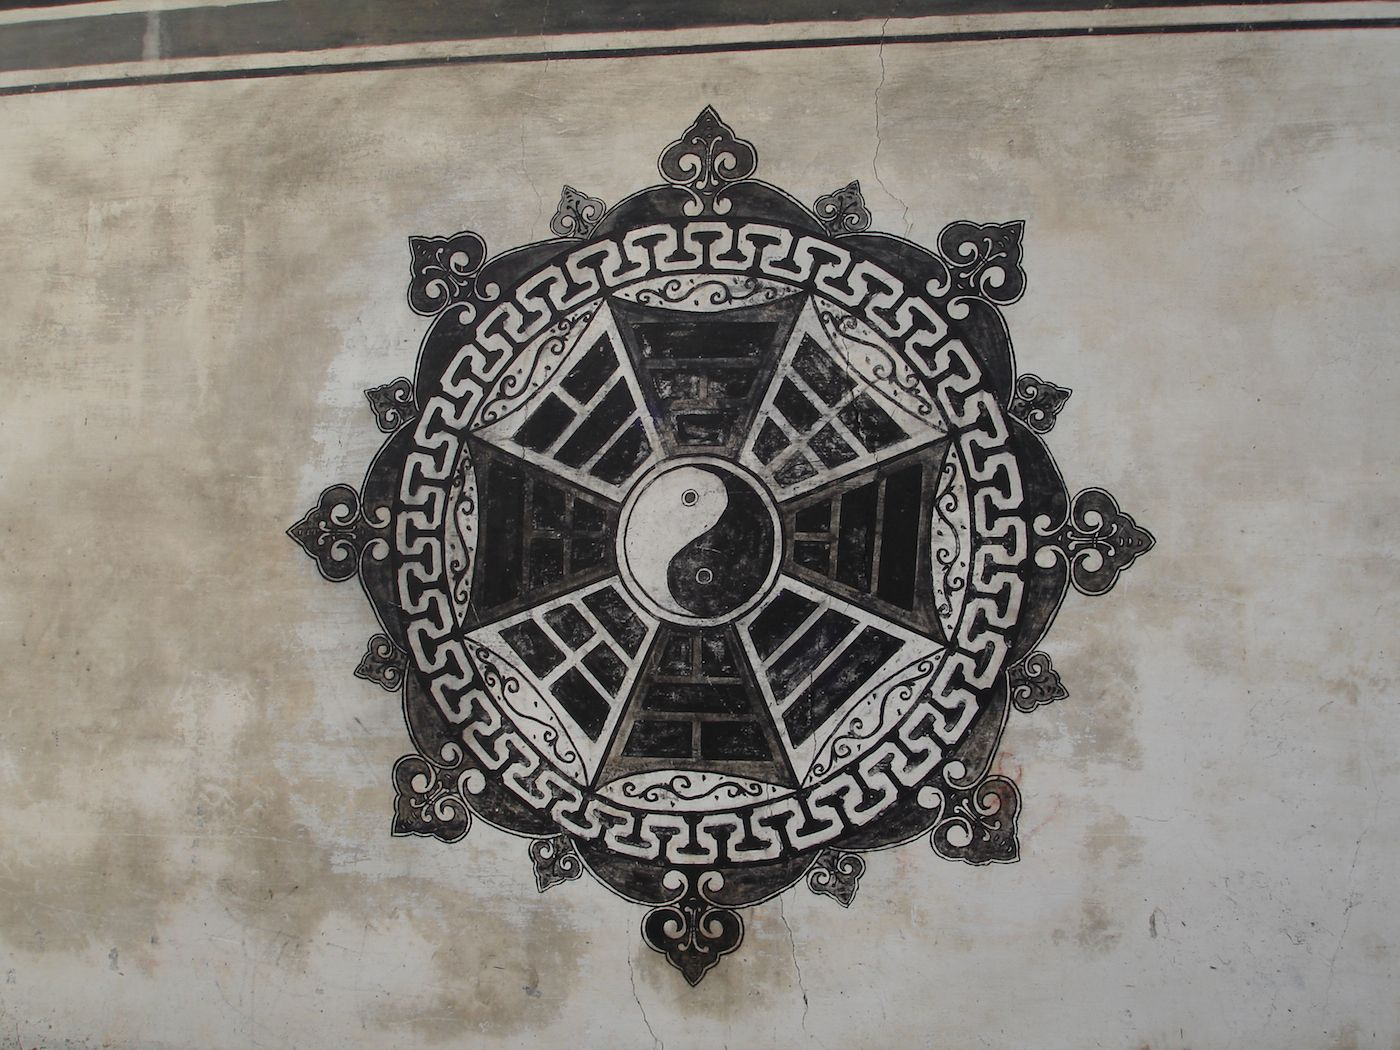 Bagua village zhuge chang le cun yin yang and bagua symbol used for bagua village zhuge chang le cun yin yang and bagua symbol used for the layout of buycottarizona Gallery